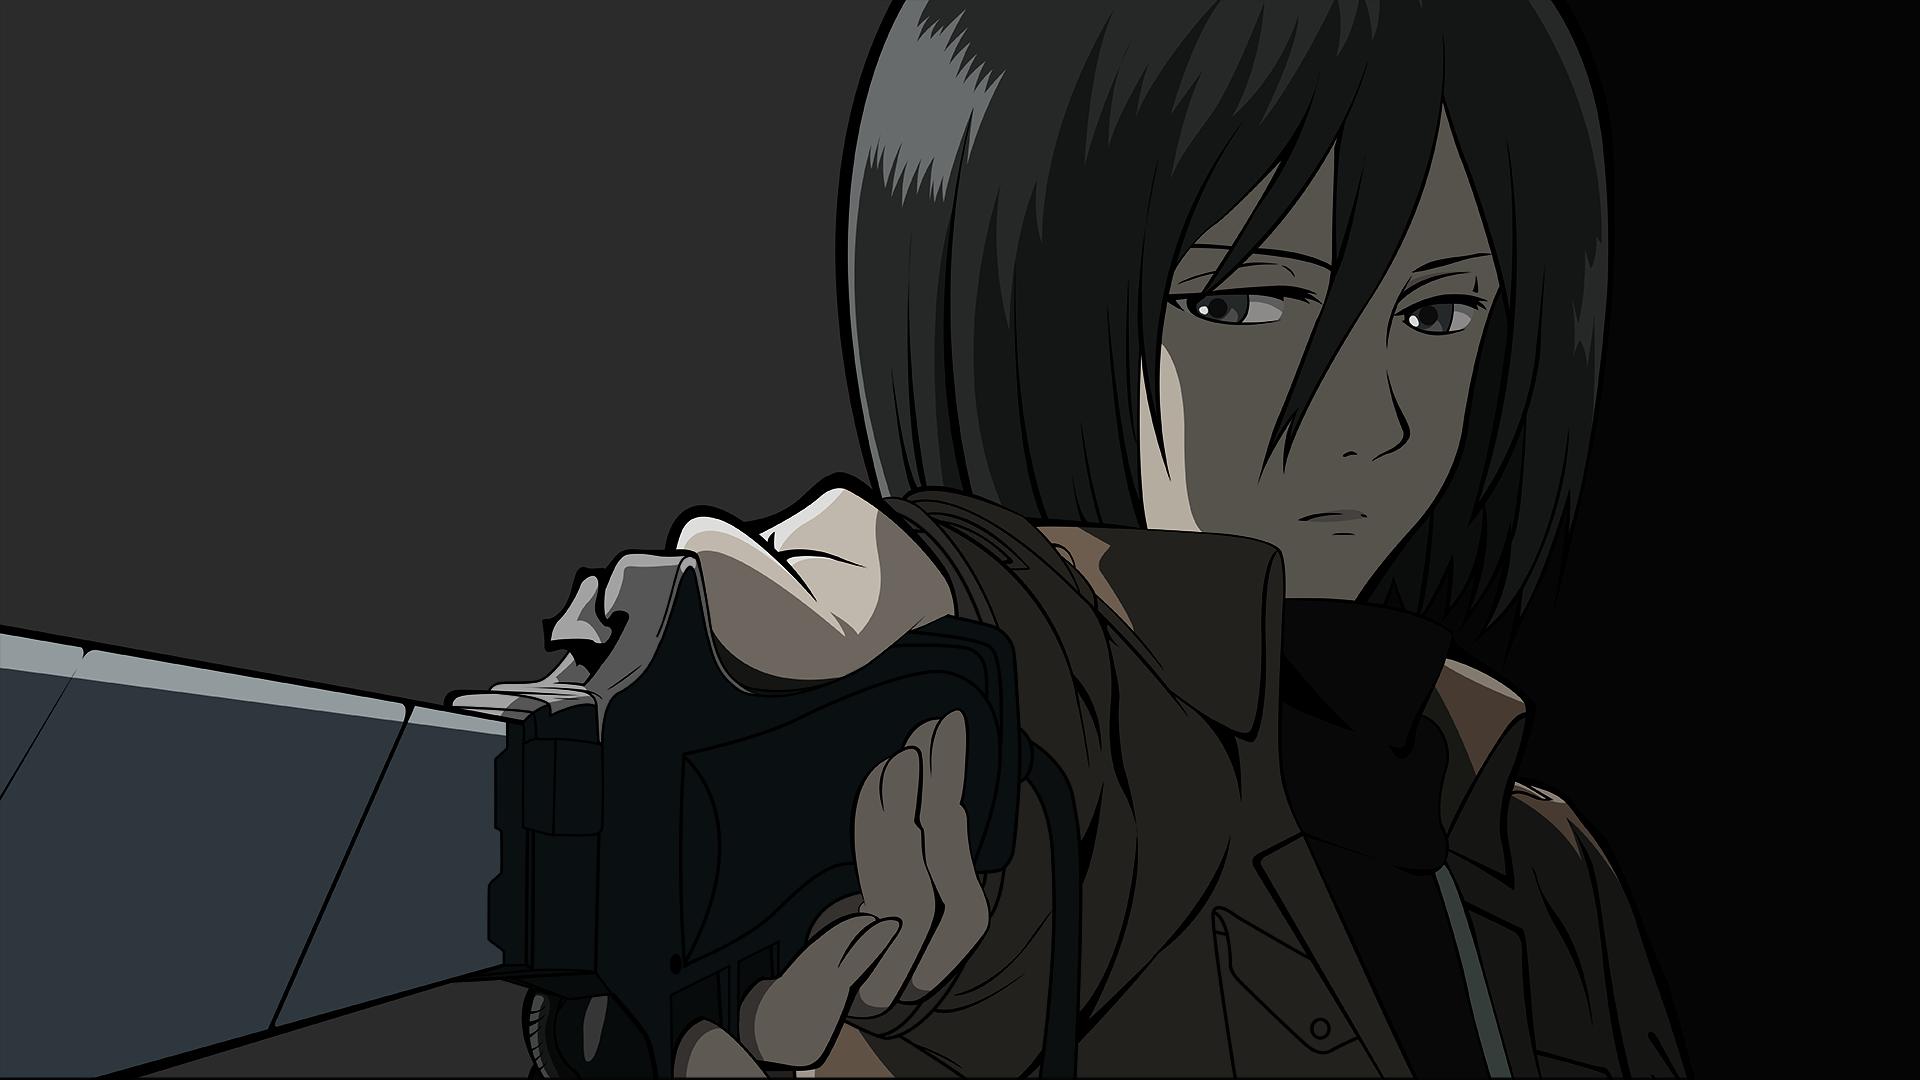 Wallpaper Attack On Titans Shingeki No Kyojin Anime Mikasa Ackerman Sword Weapon 1920x1080 Hanako 1880869 Hd Wallpapers Wallhere